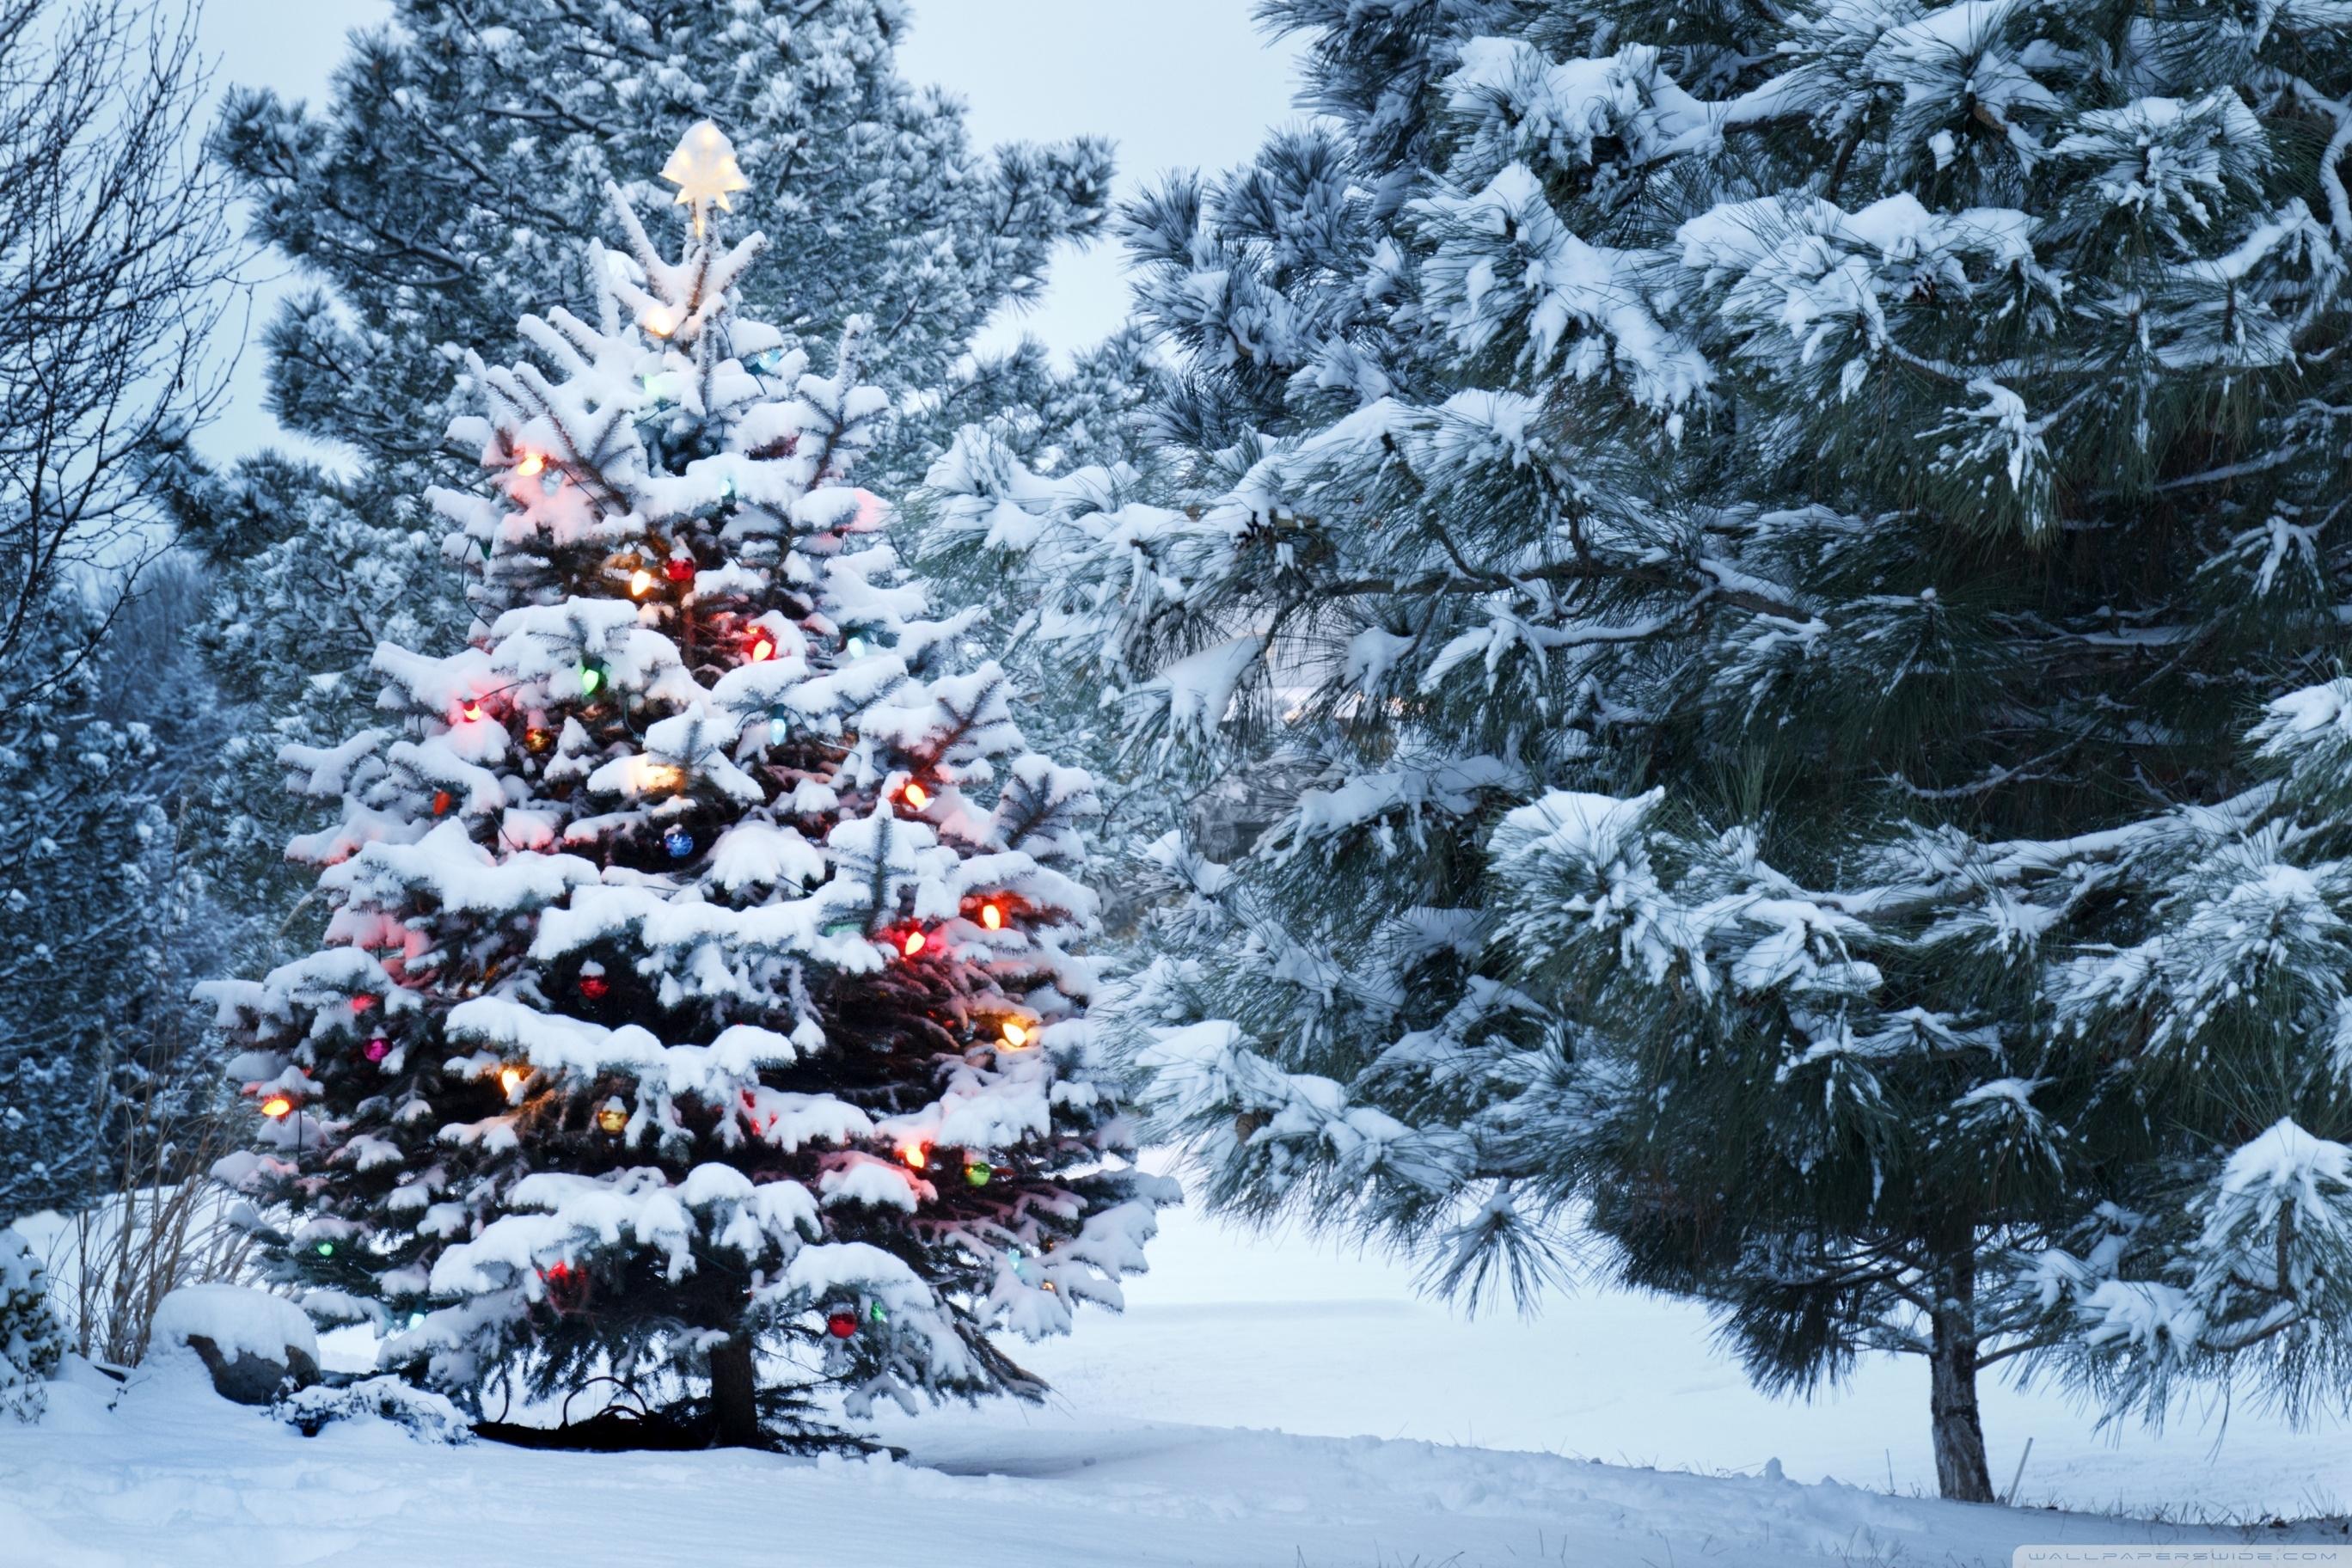 beautiful outdoor christmas tree ❤ 4k hd desktop wallpaper for 4k